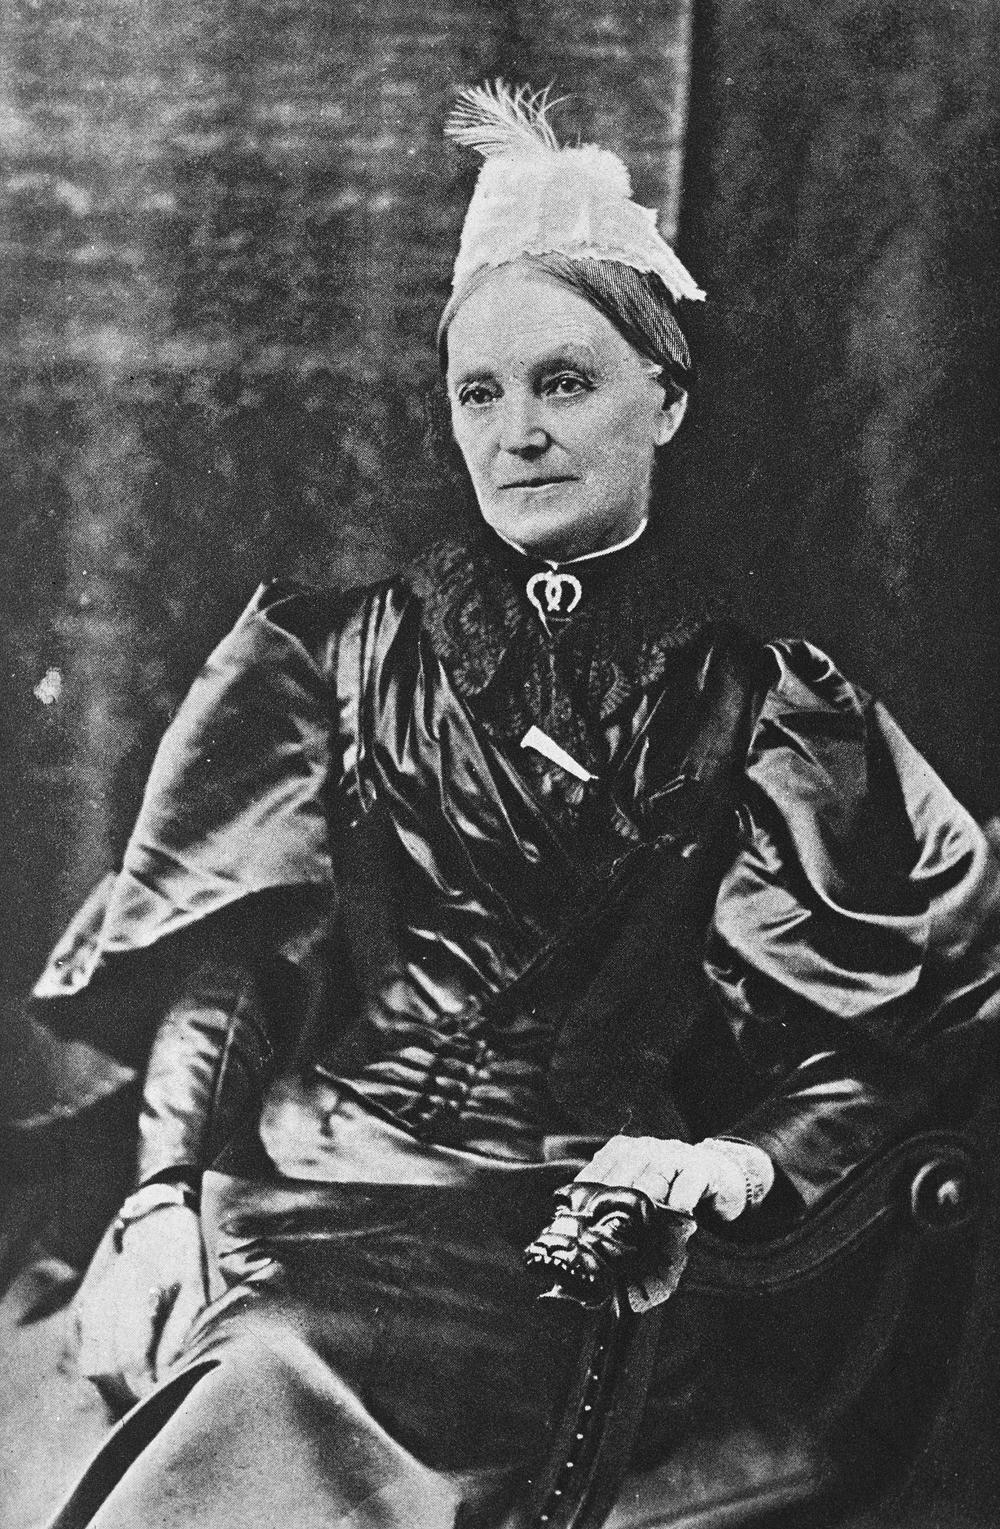 Photo de Lady Strathcona (Isabella Sophia Hardisty) assise sur un fauteuil, en robe de satin